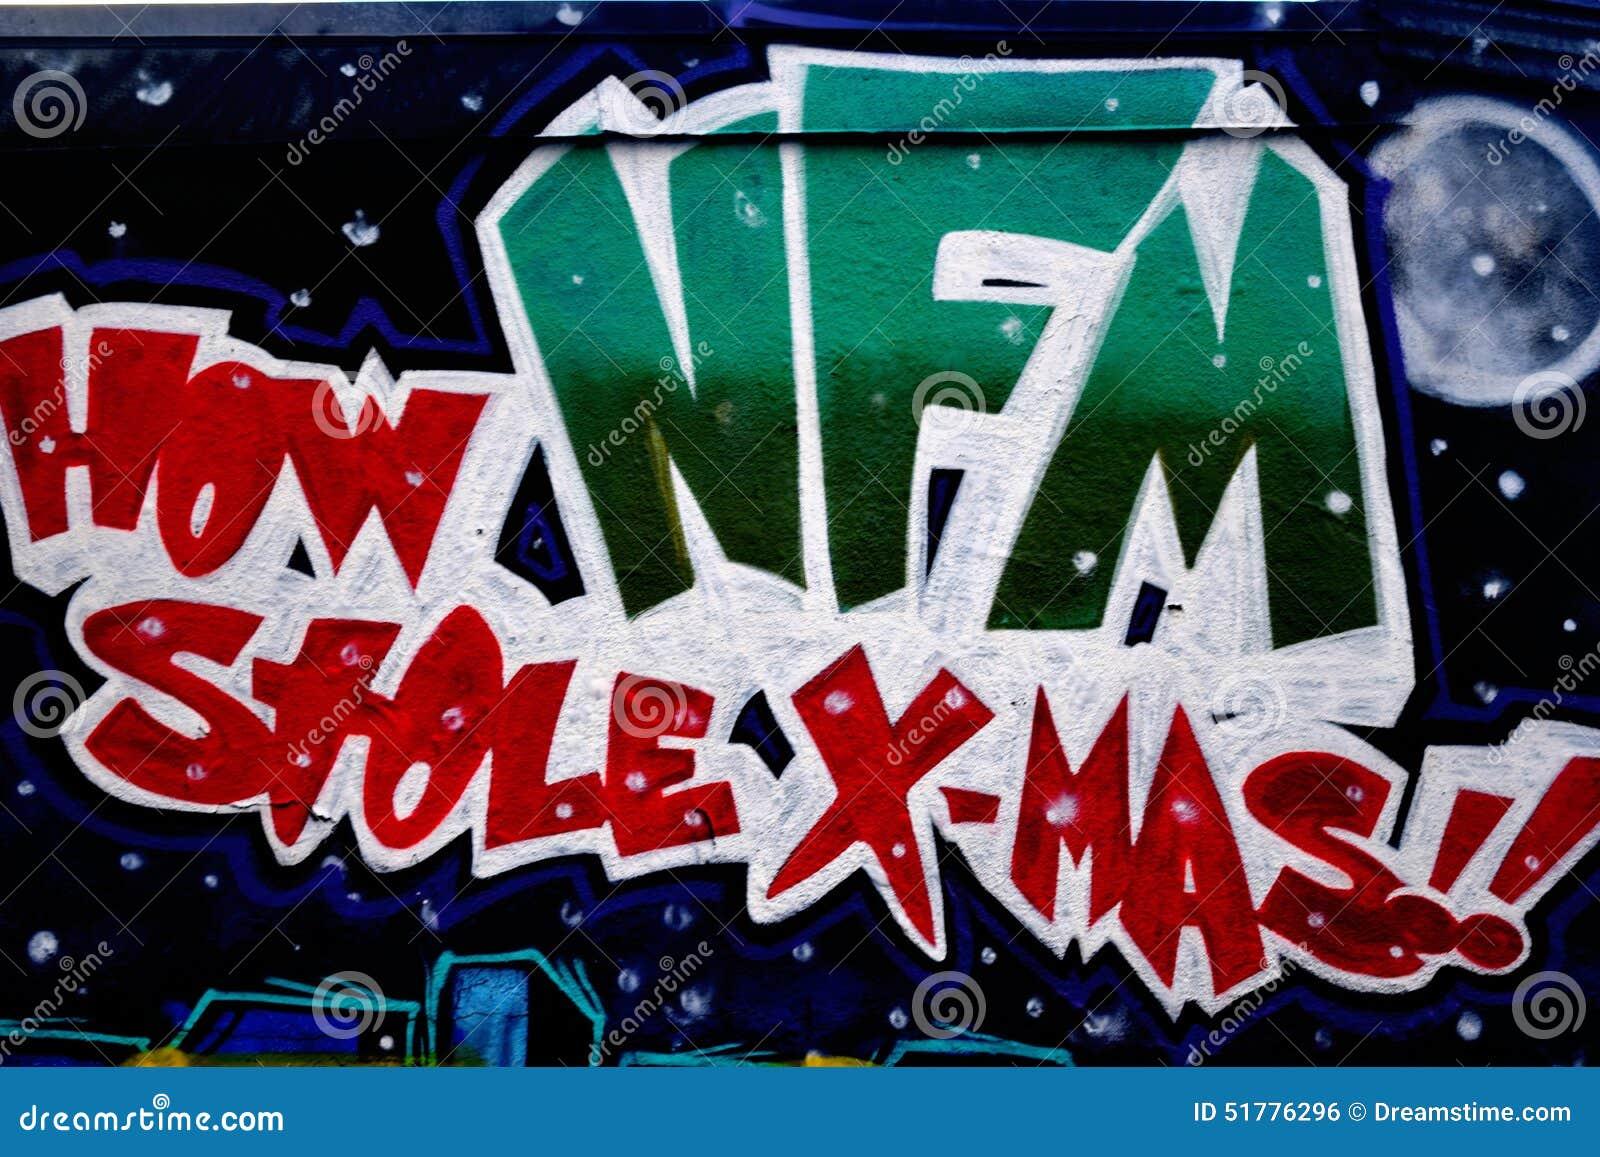 Graffiti wall dallas - Graffiti Wall Downtown Houston Tx Xmas Royalty Free Stock Image